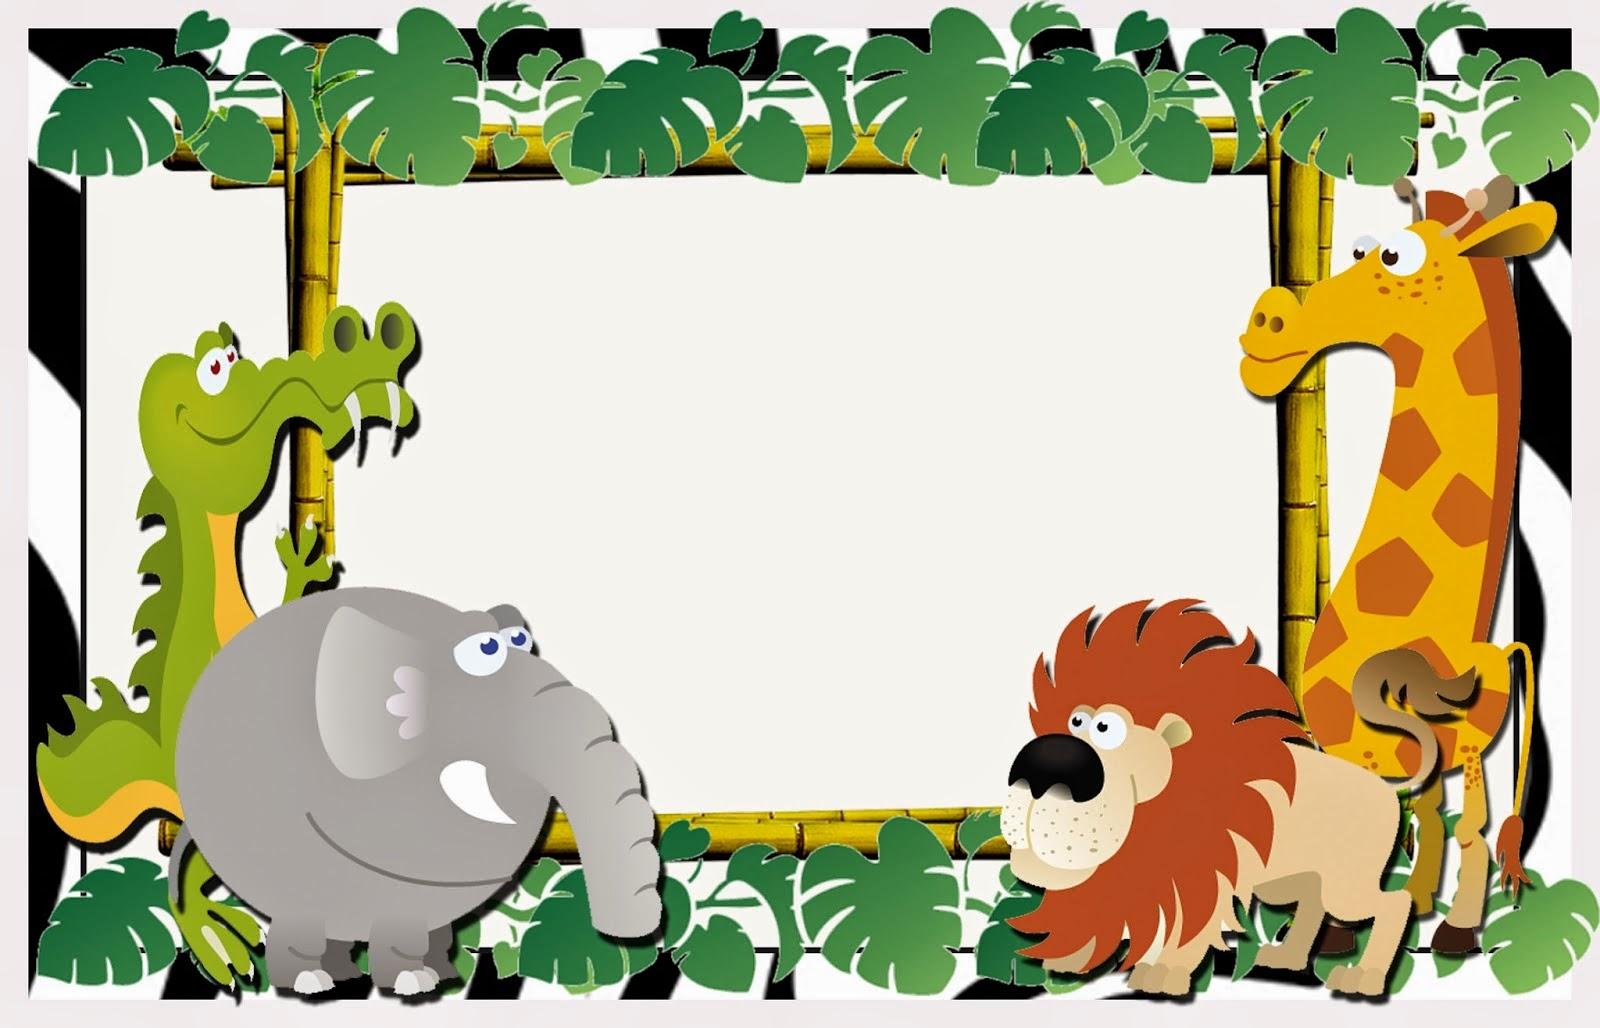 La selva invitaciones o tarjetas para imprimir gratis for Design del mazzo online